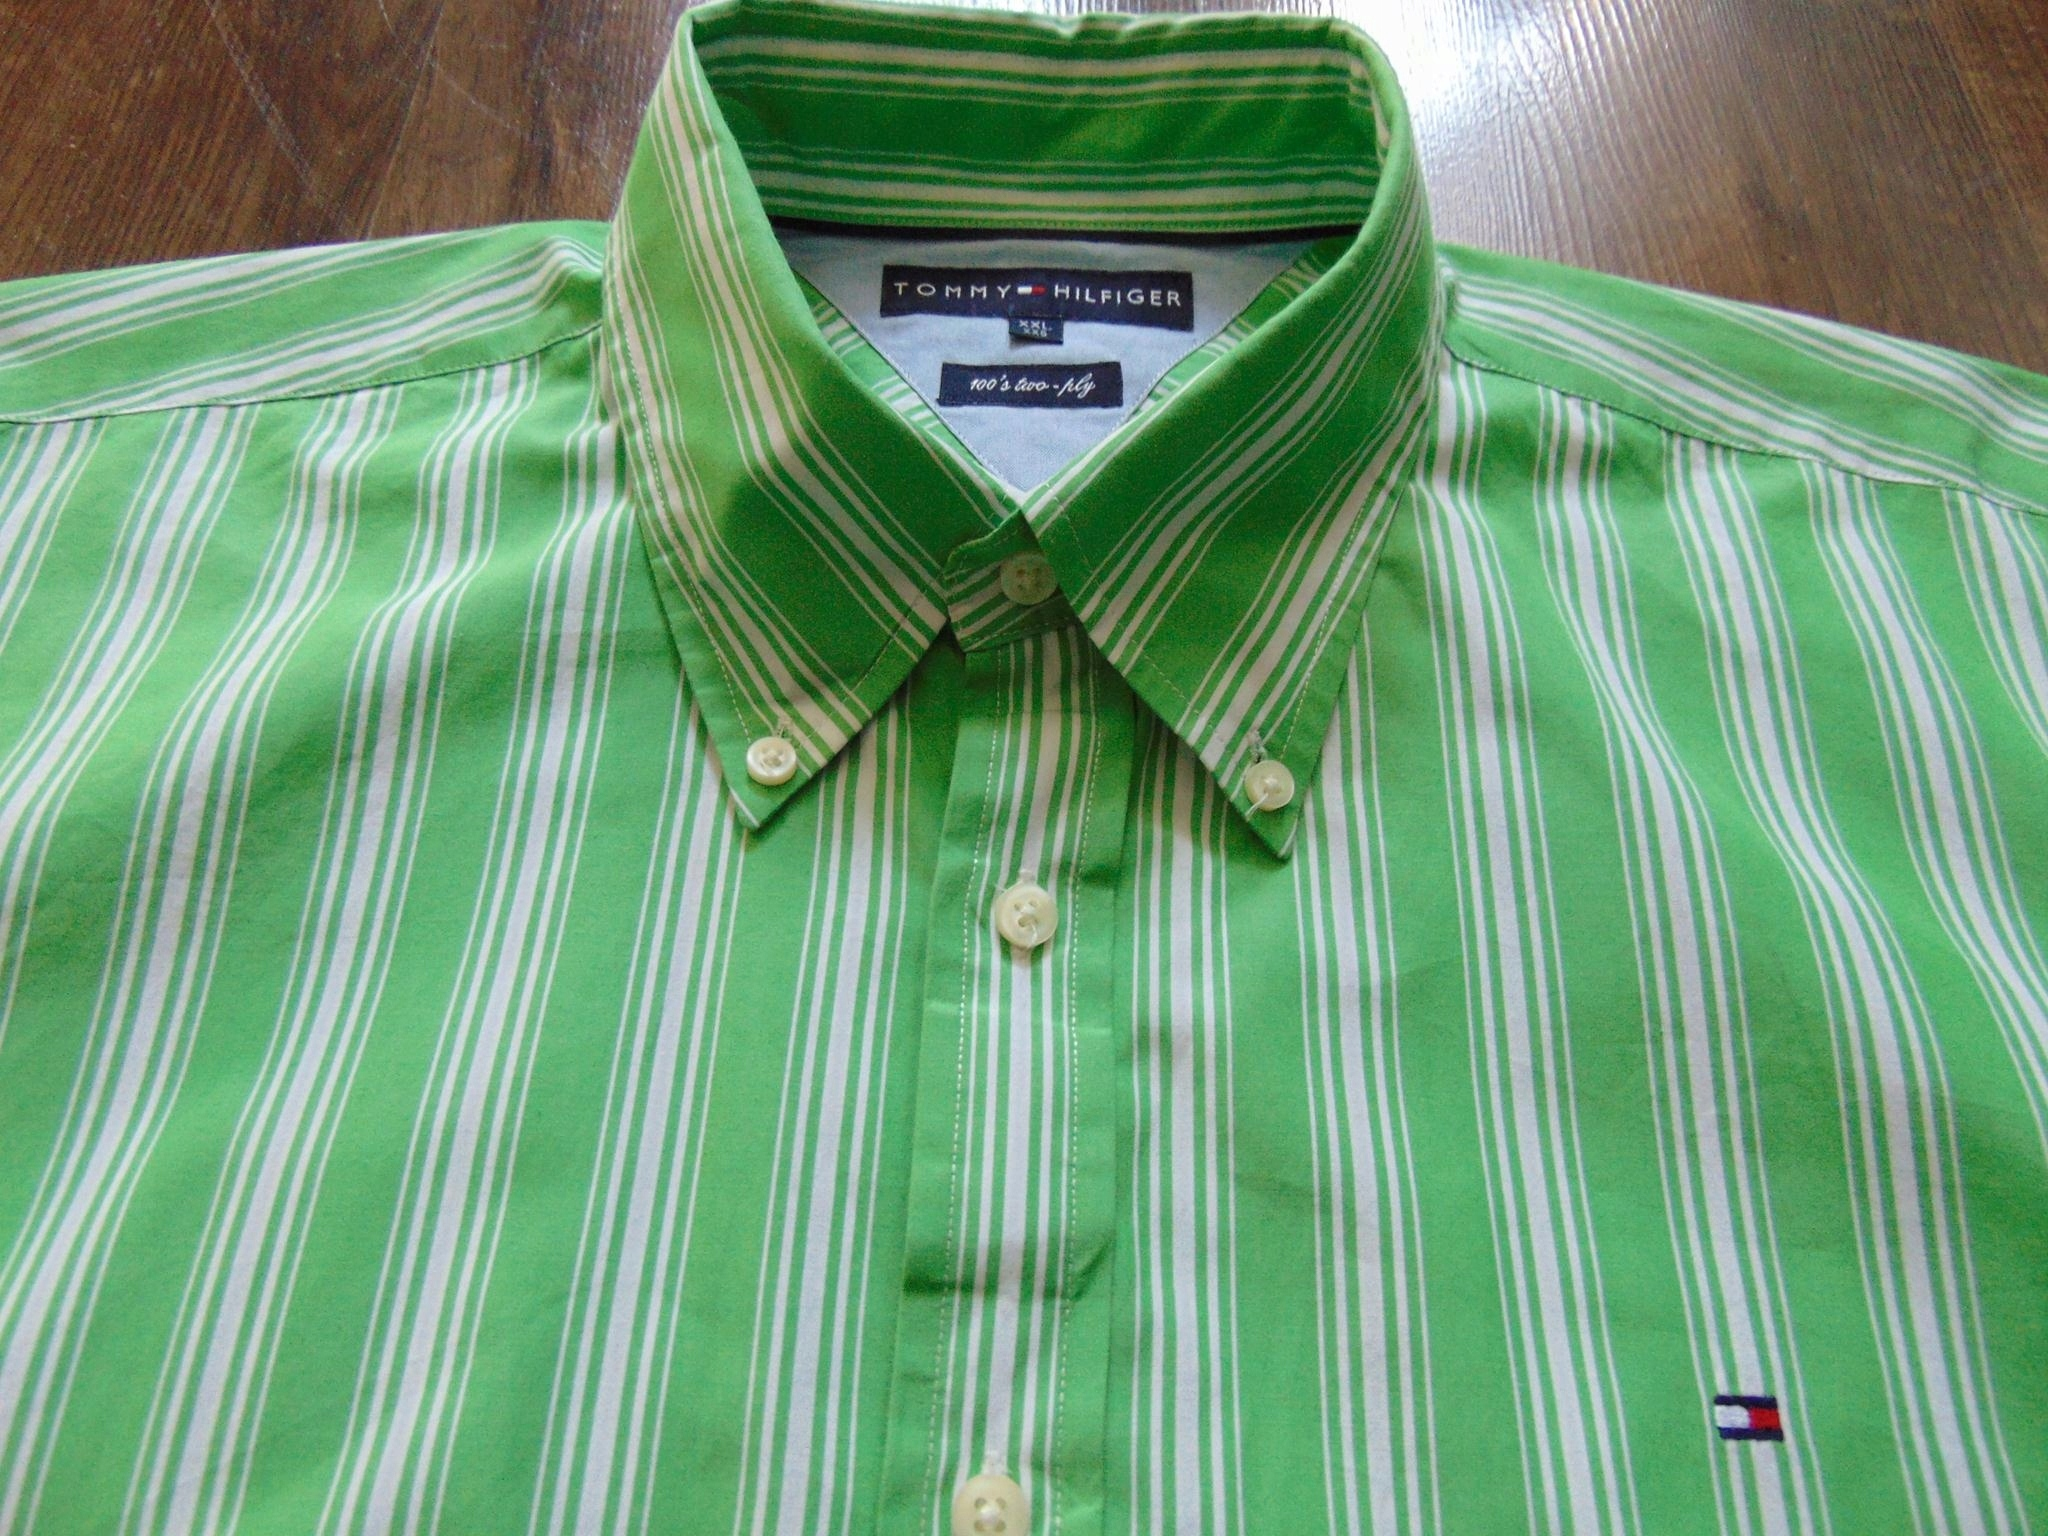 07a86aa55b510 gant koszula brand tommy hilfiger Legnica w Oficjalnym Archiwum Allegro -  archiwum ofert